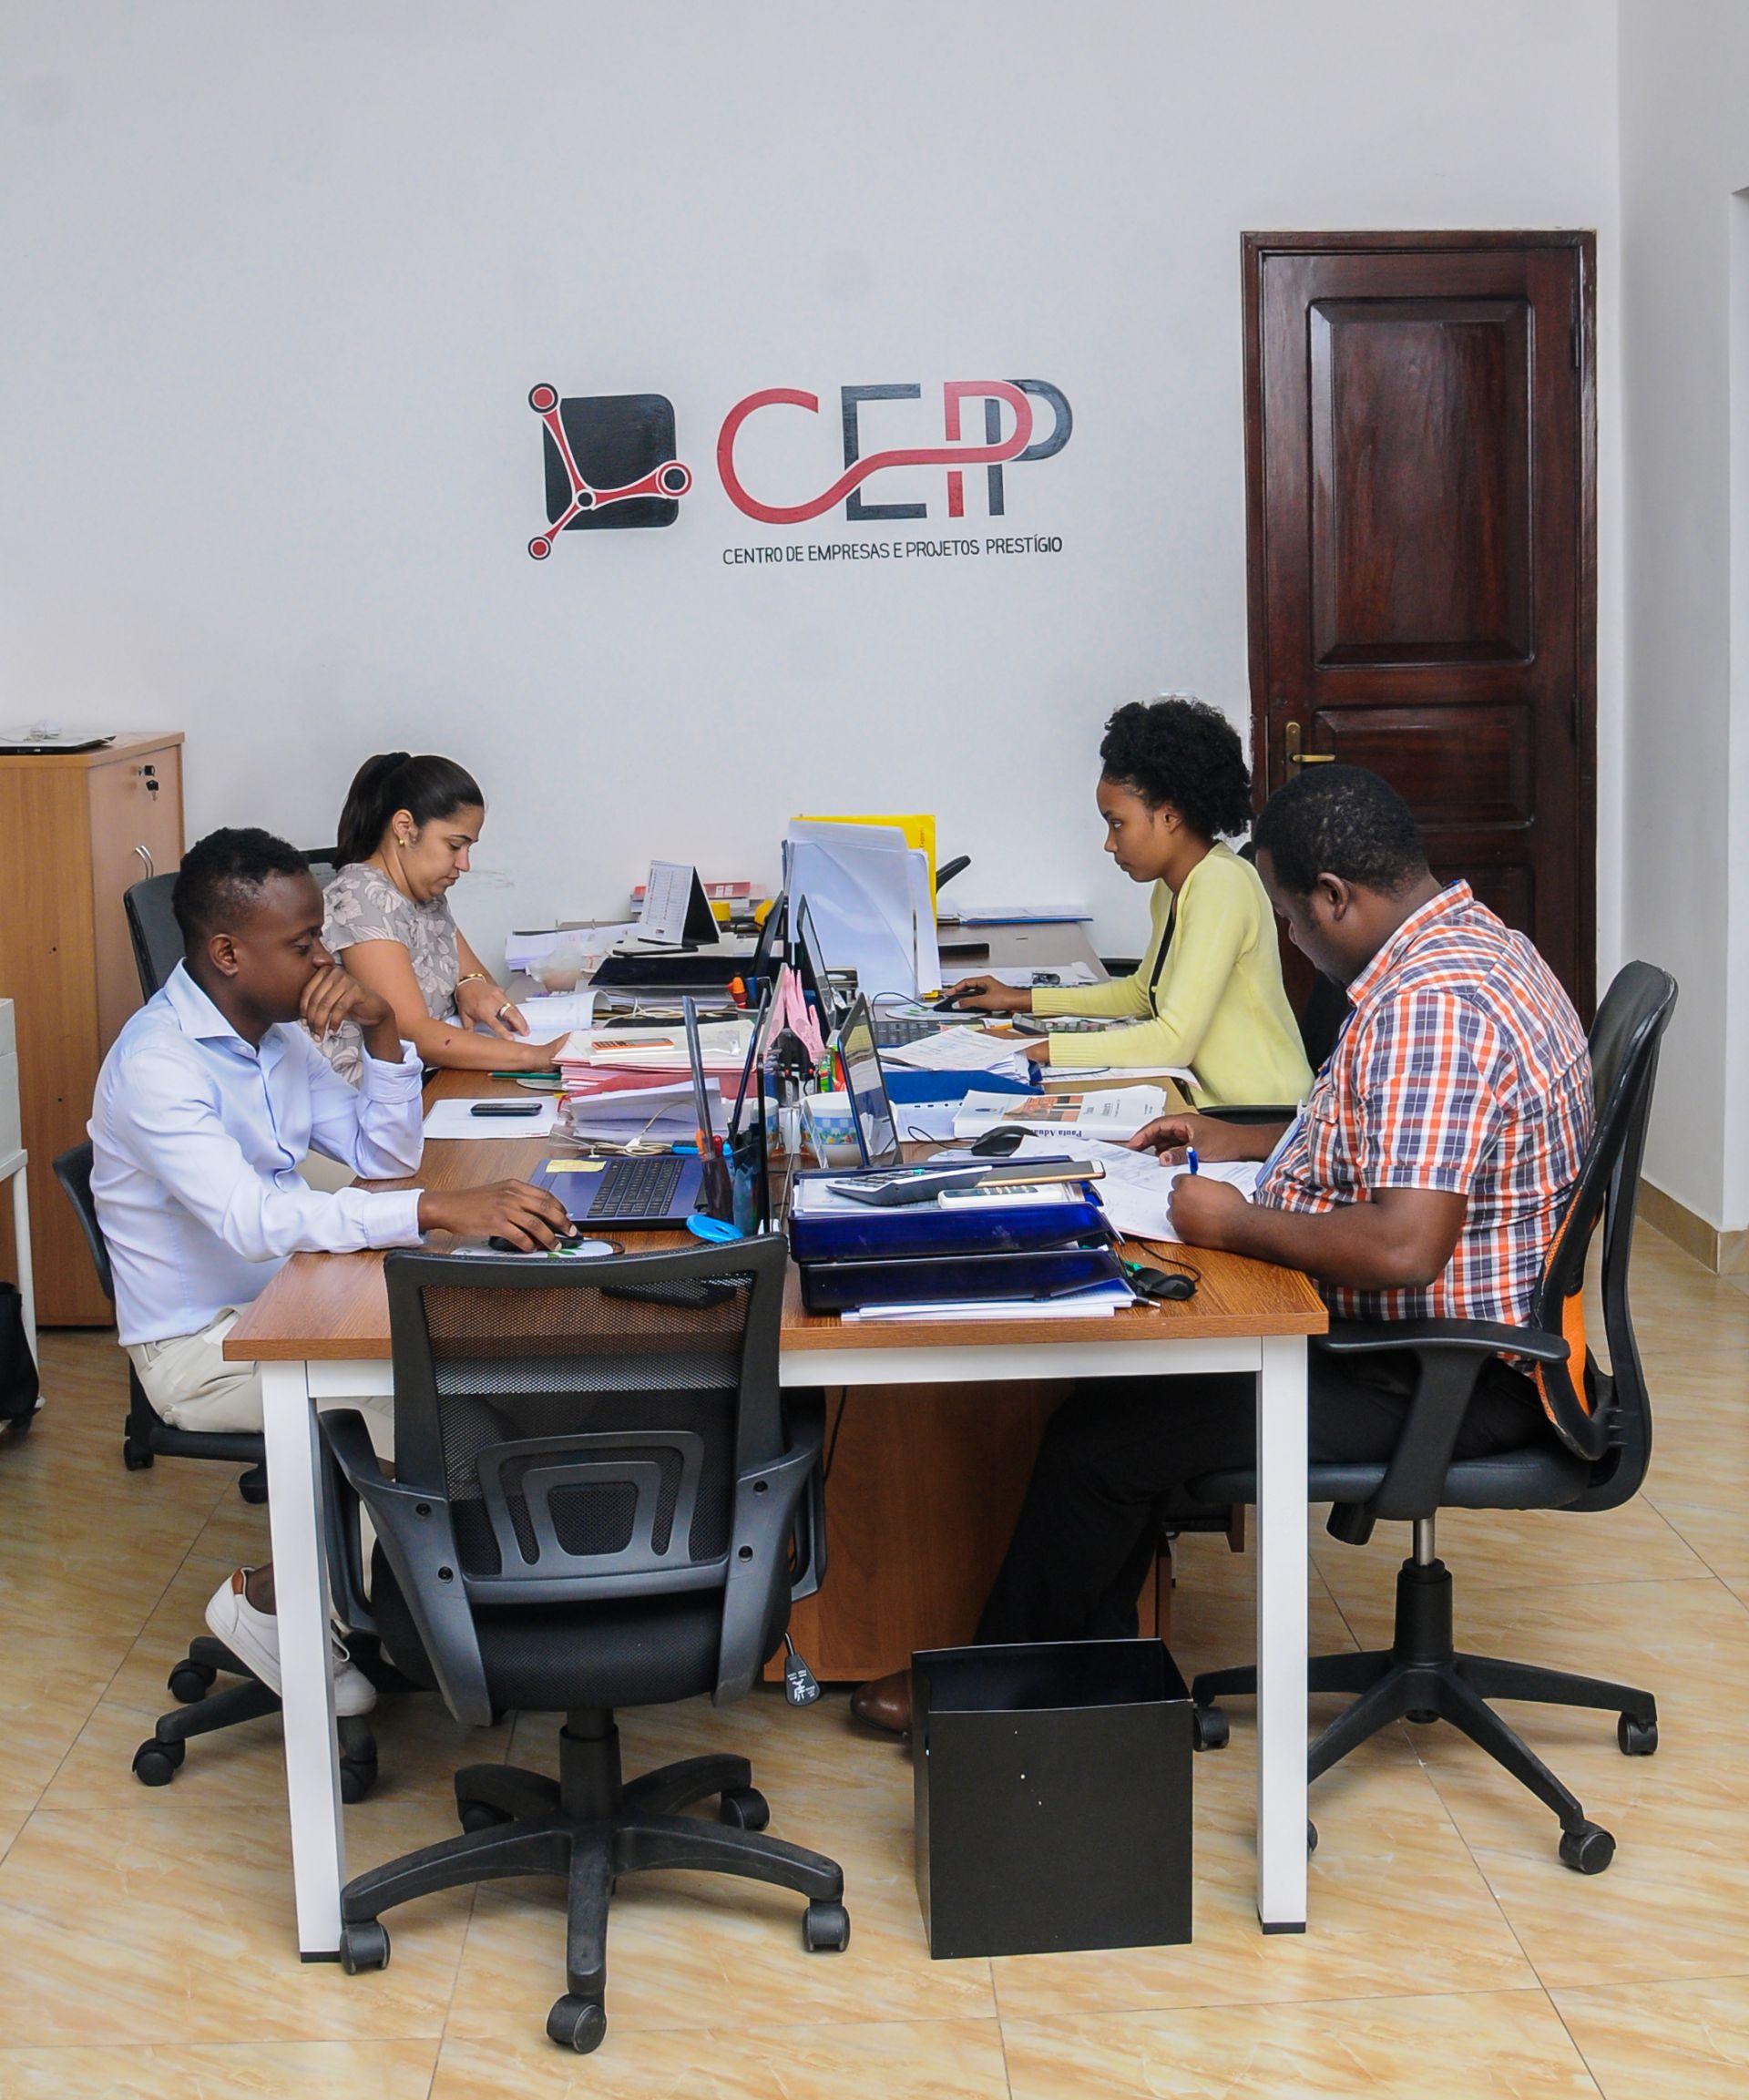 Centro de Empresas e Projectos Prestigio (CEPP), Luanda